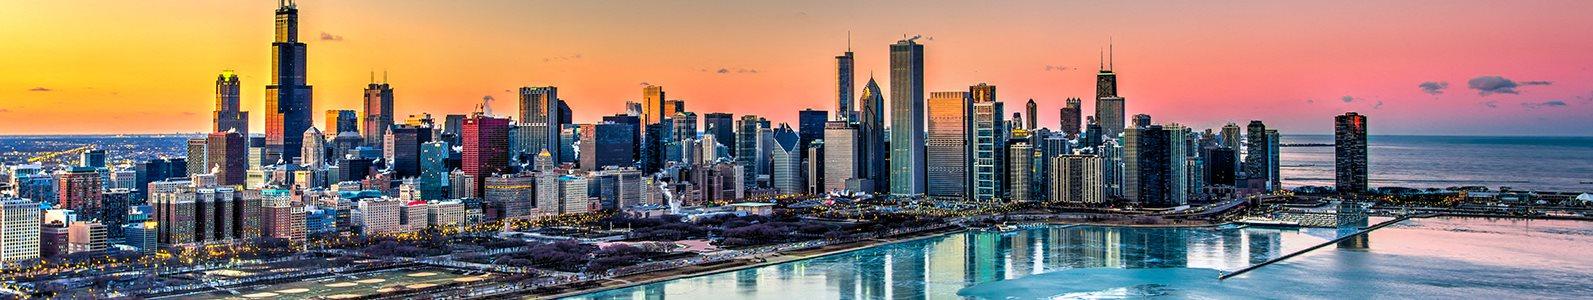 Sunset over the Chicago skyline